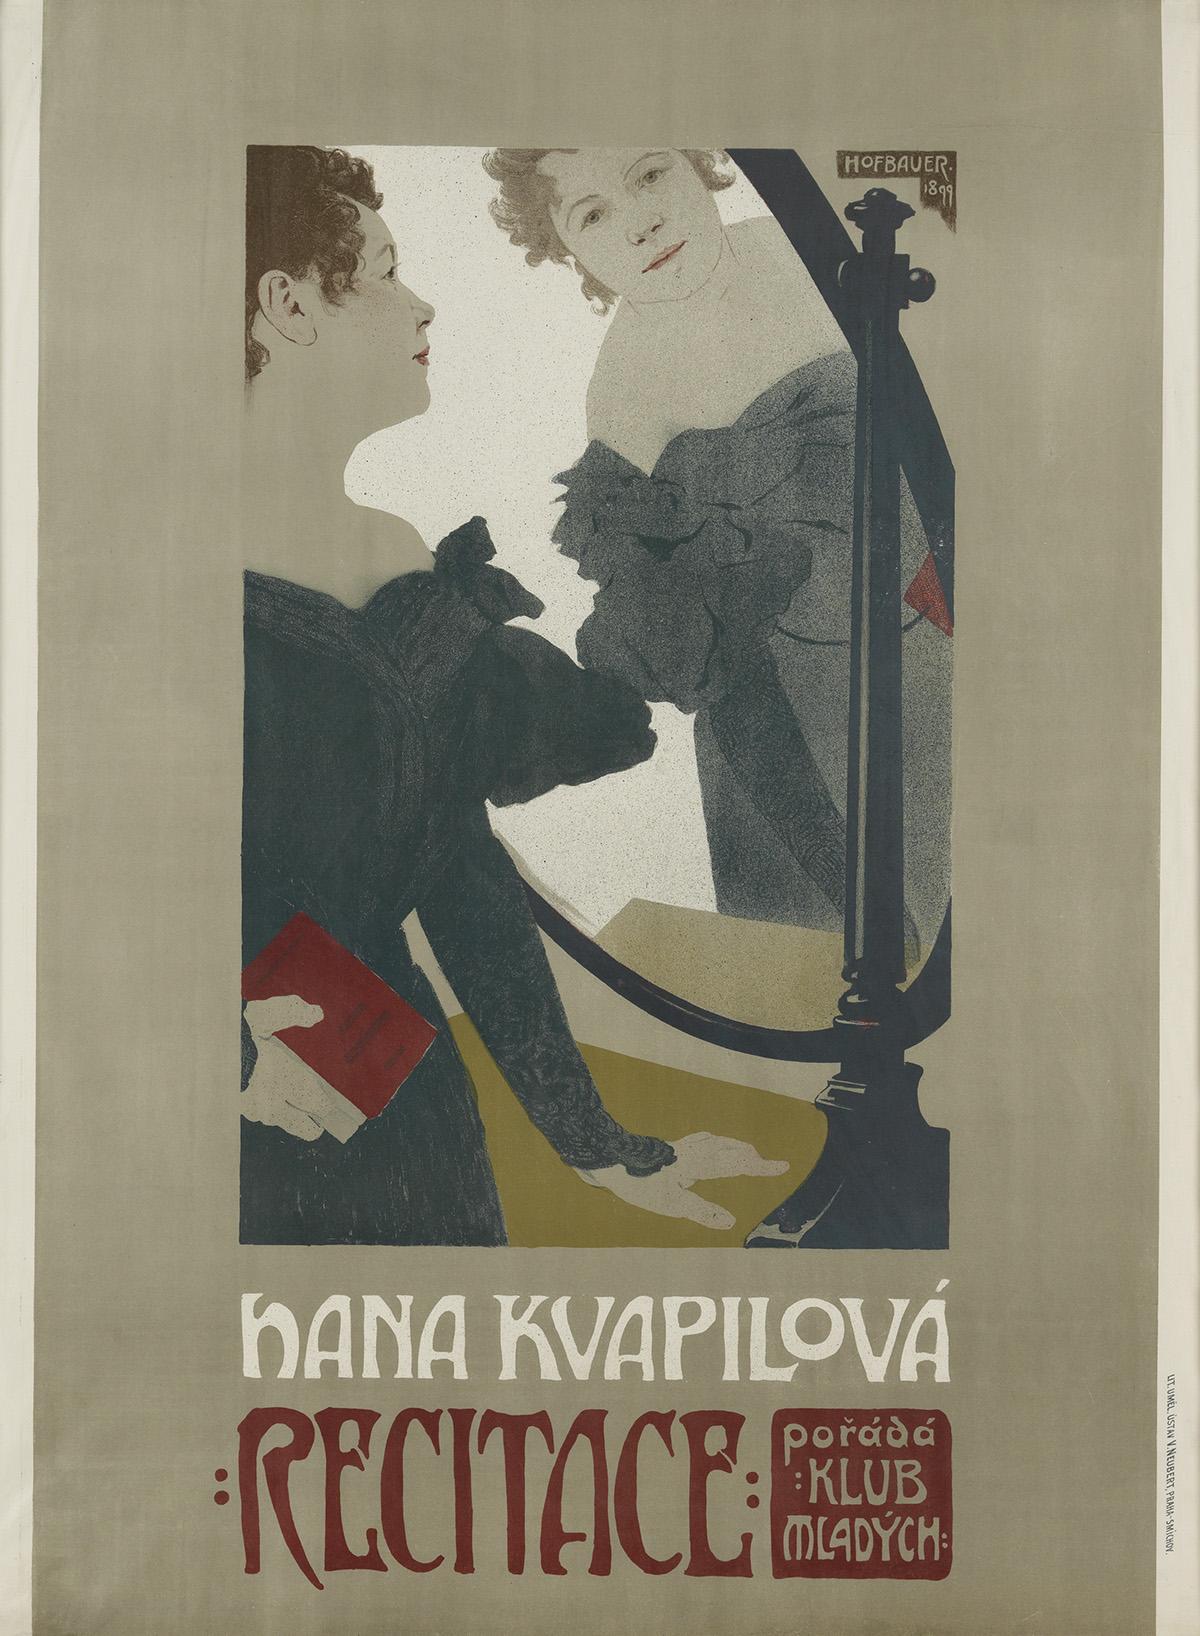 ARNOST HOFBAUER (1869-1944). HANA KVAPILOVA RECITACE. 1899. 43x32 inches, 110x82 cm. V. Neubert, Praha-Smichov.